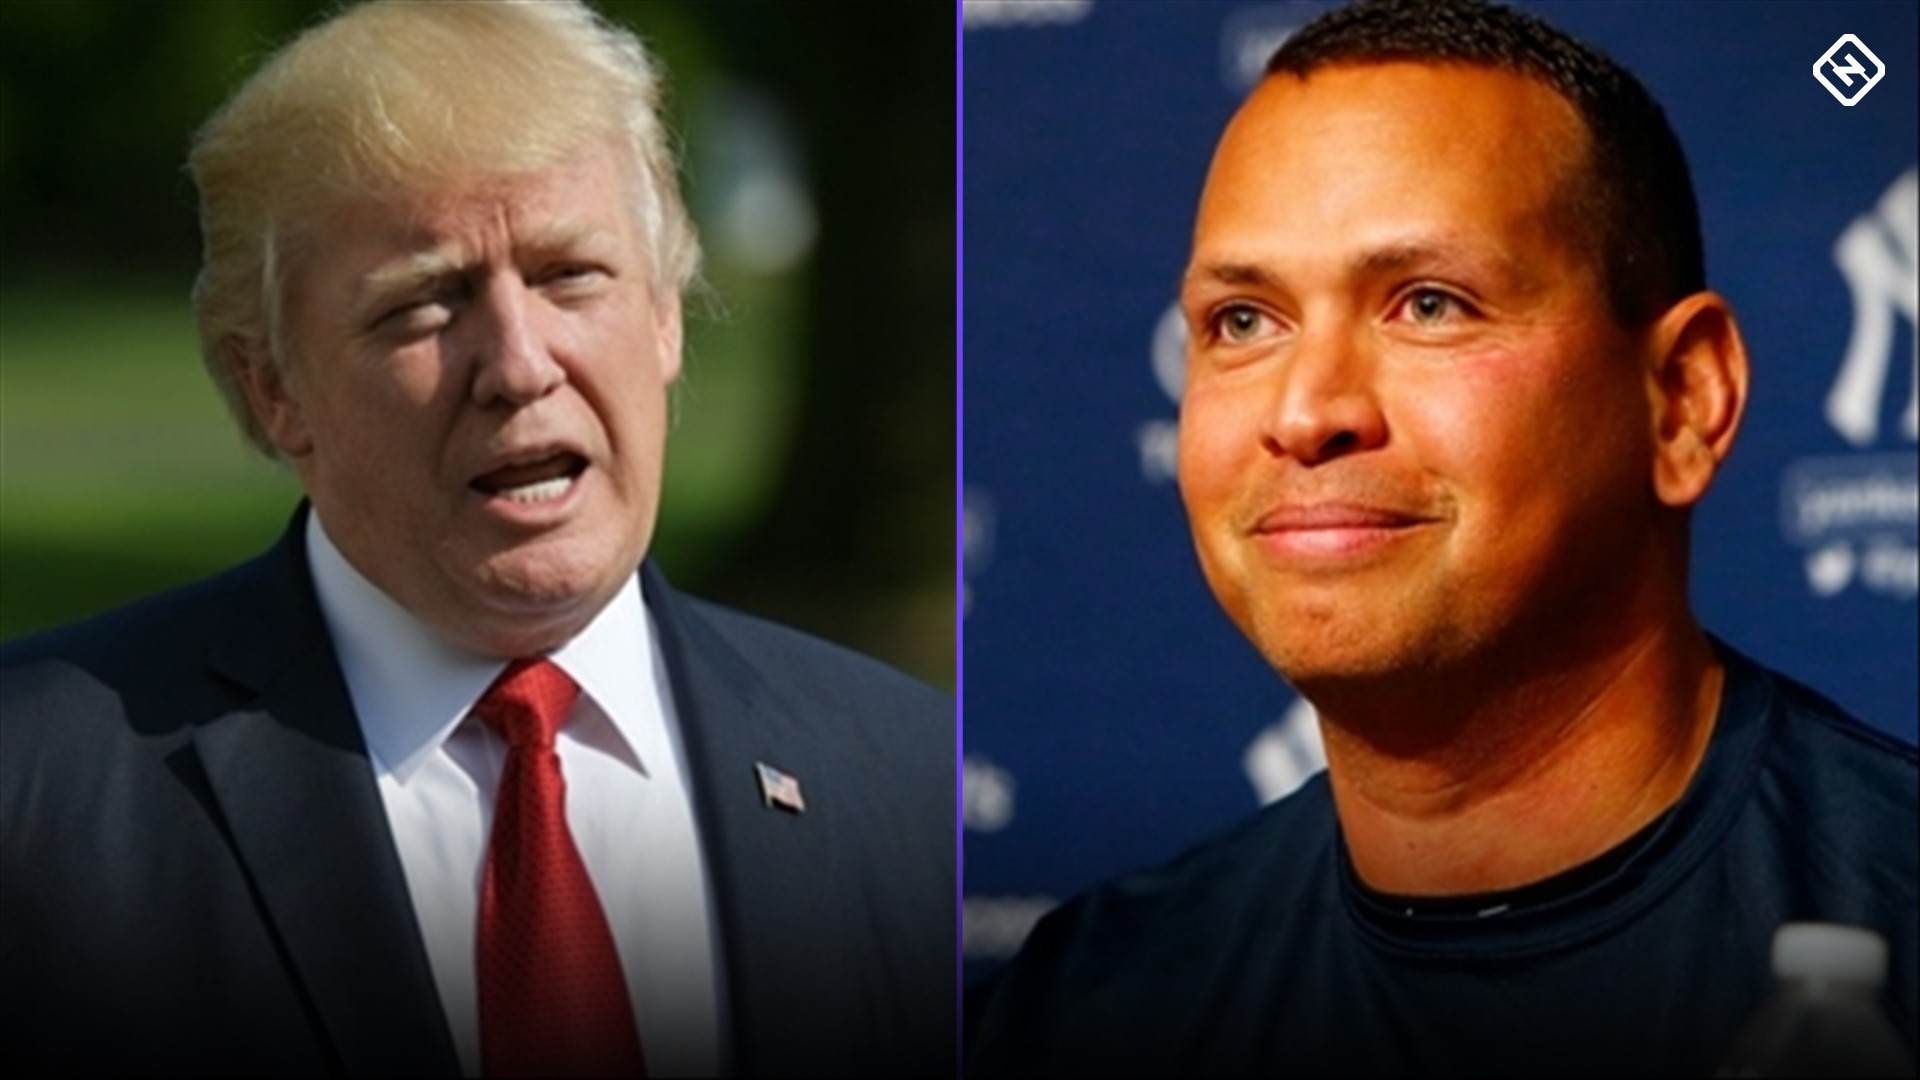 Donald Trump le pidió consejo a Alex Rodríguez sobre la respuesta al coronavirus, según un informe 92